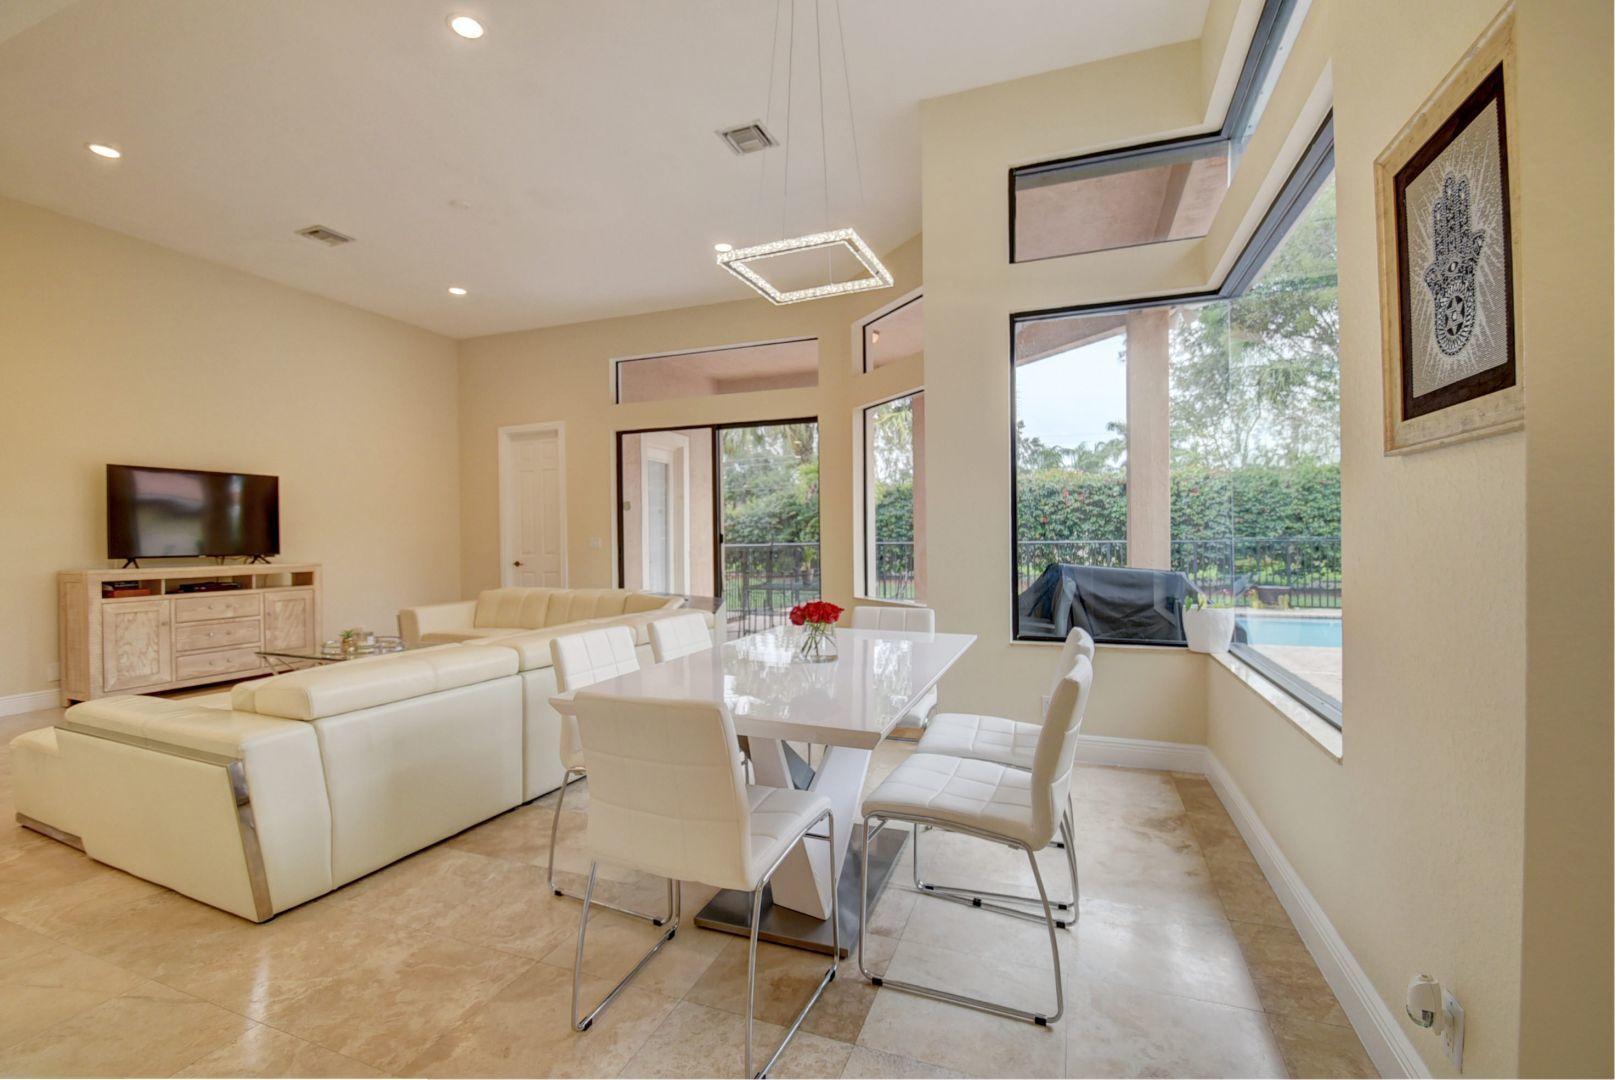 16034 Rosecroft Terrace Delray Beach FL 33446 - photo 11